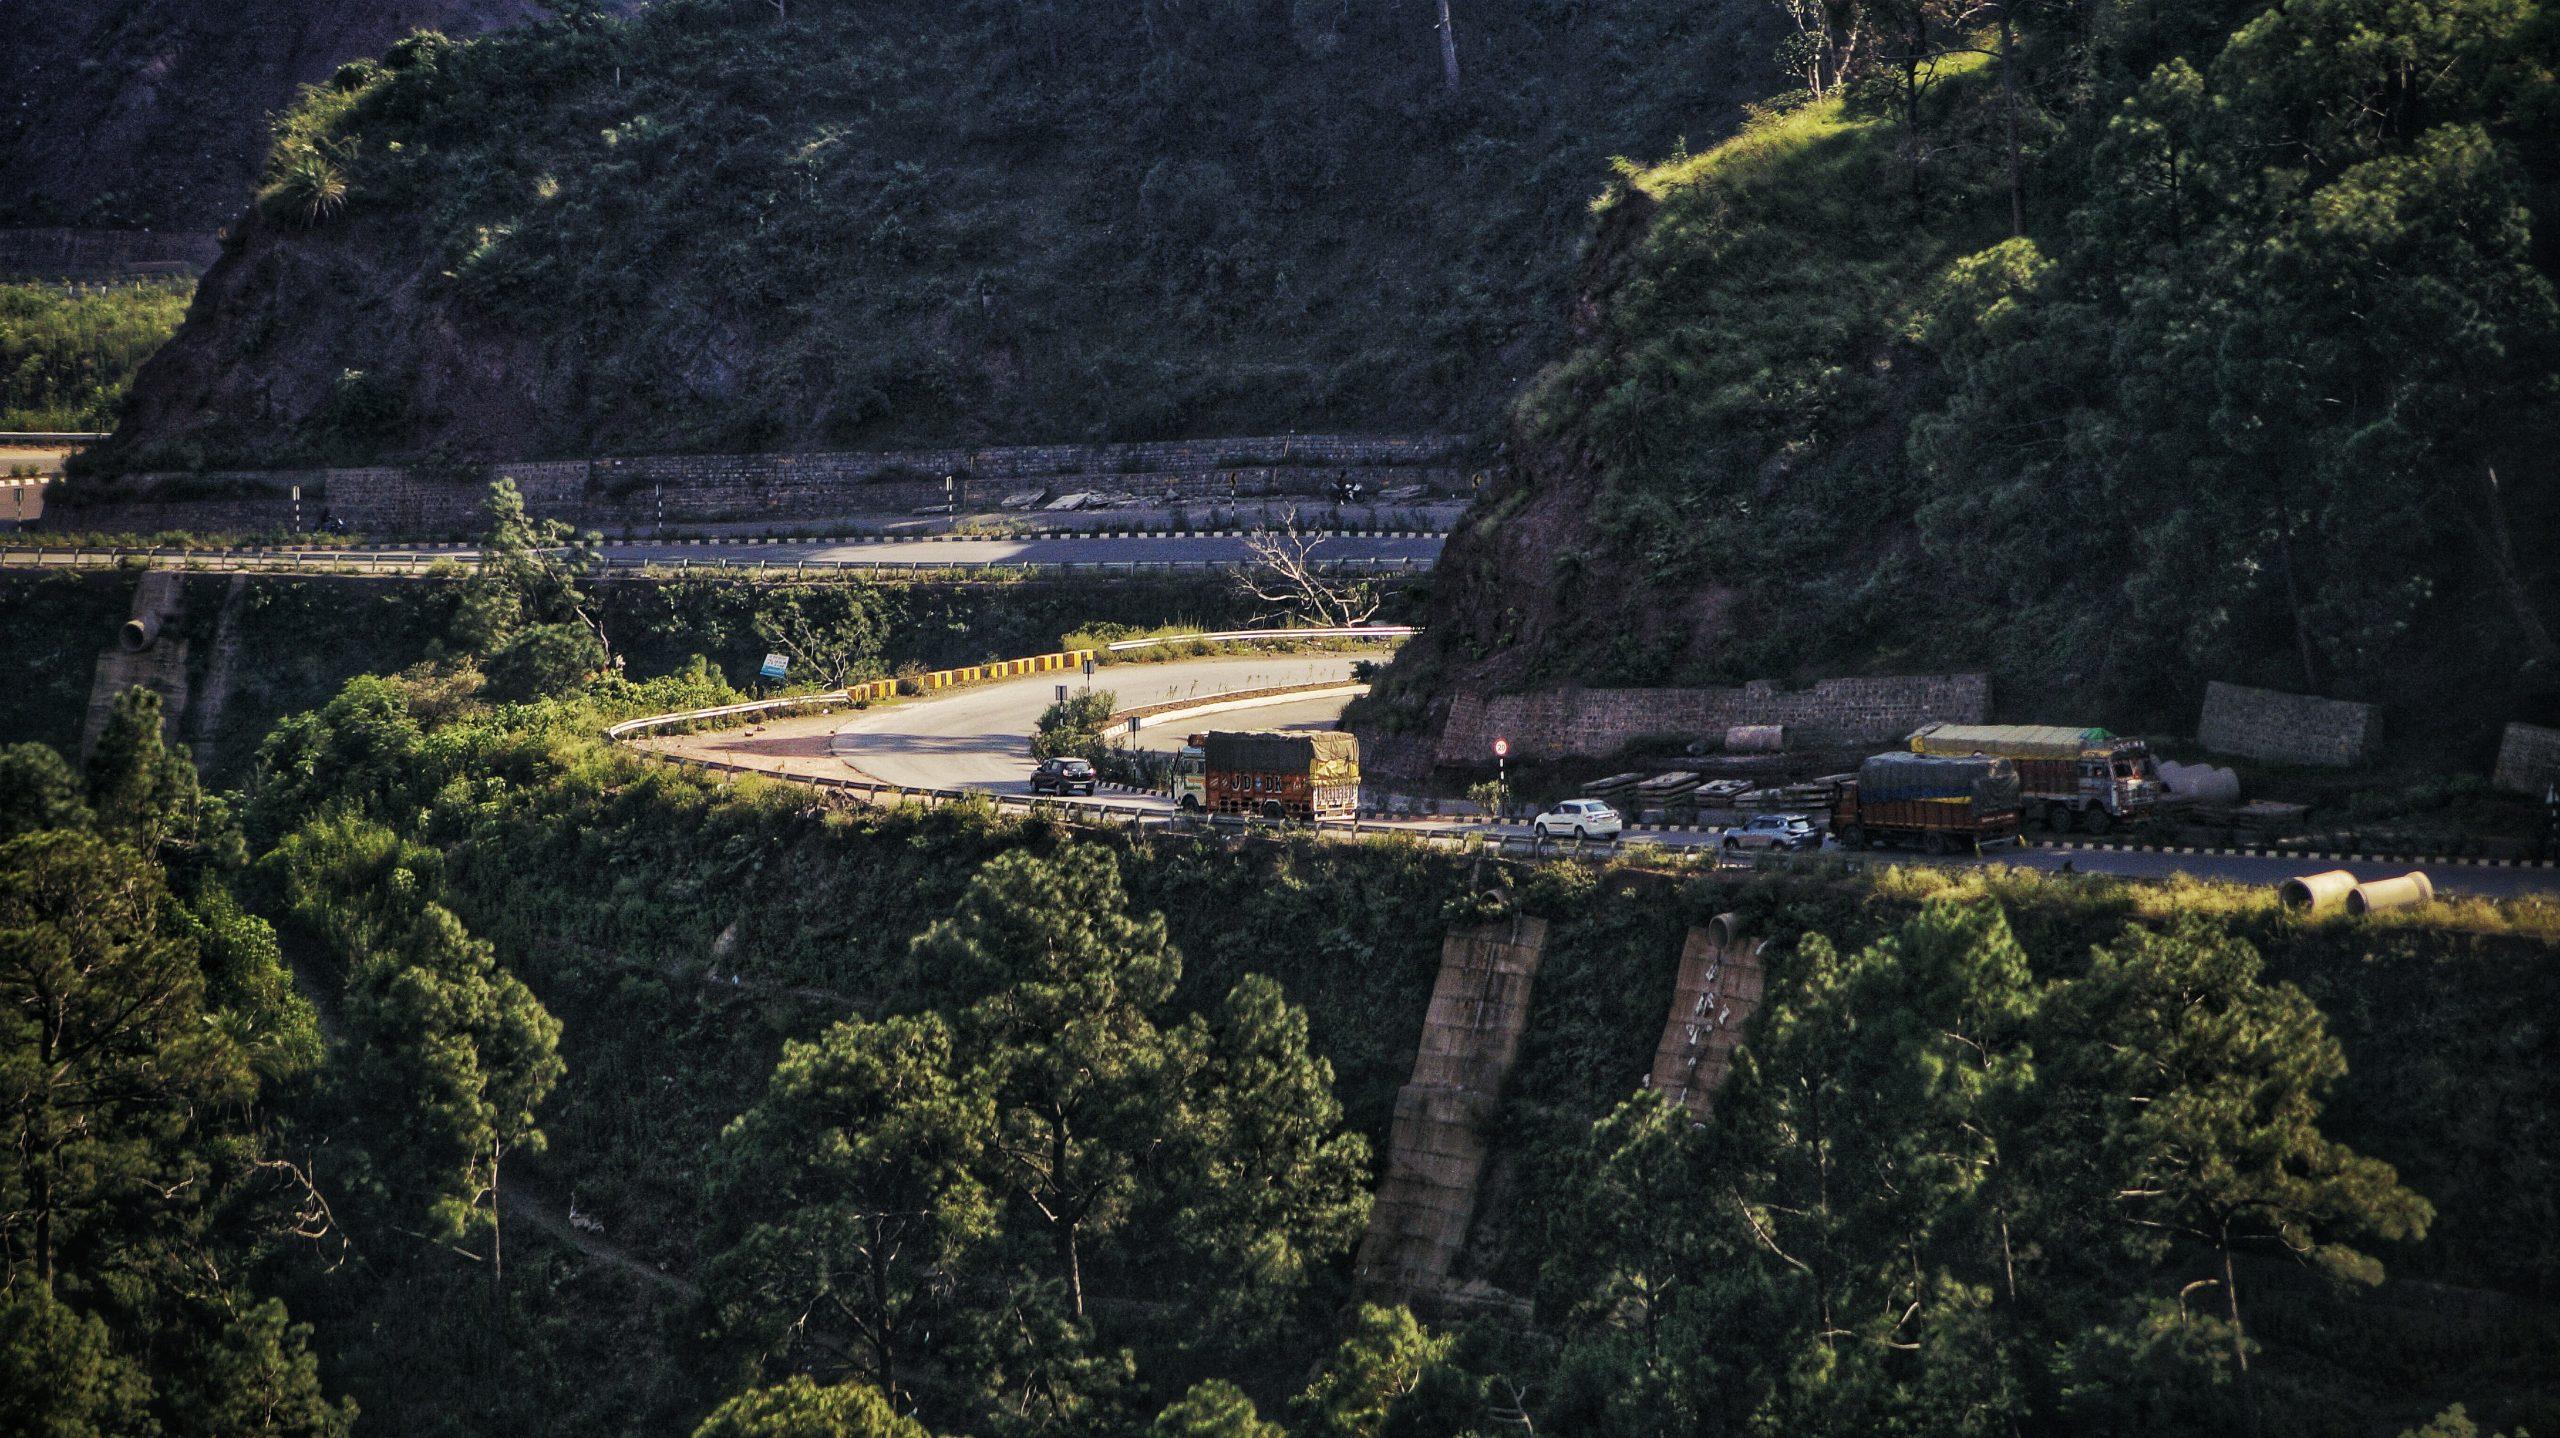 Highway through the hills.